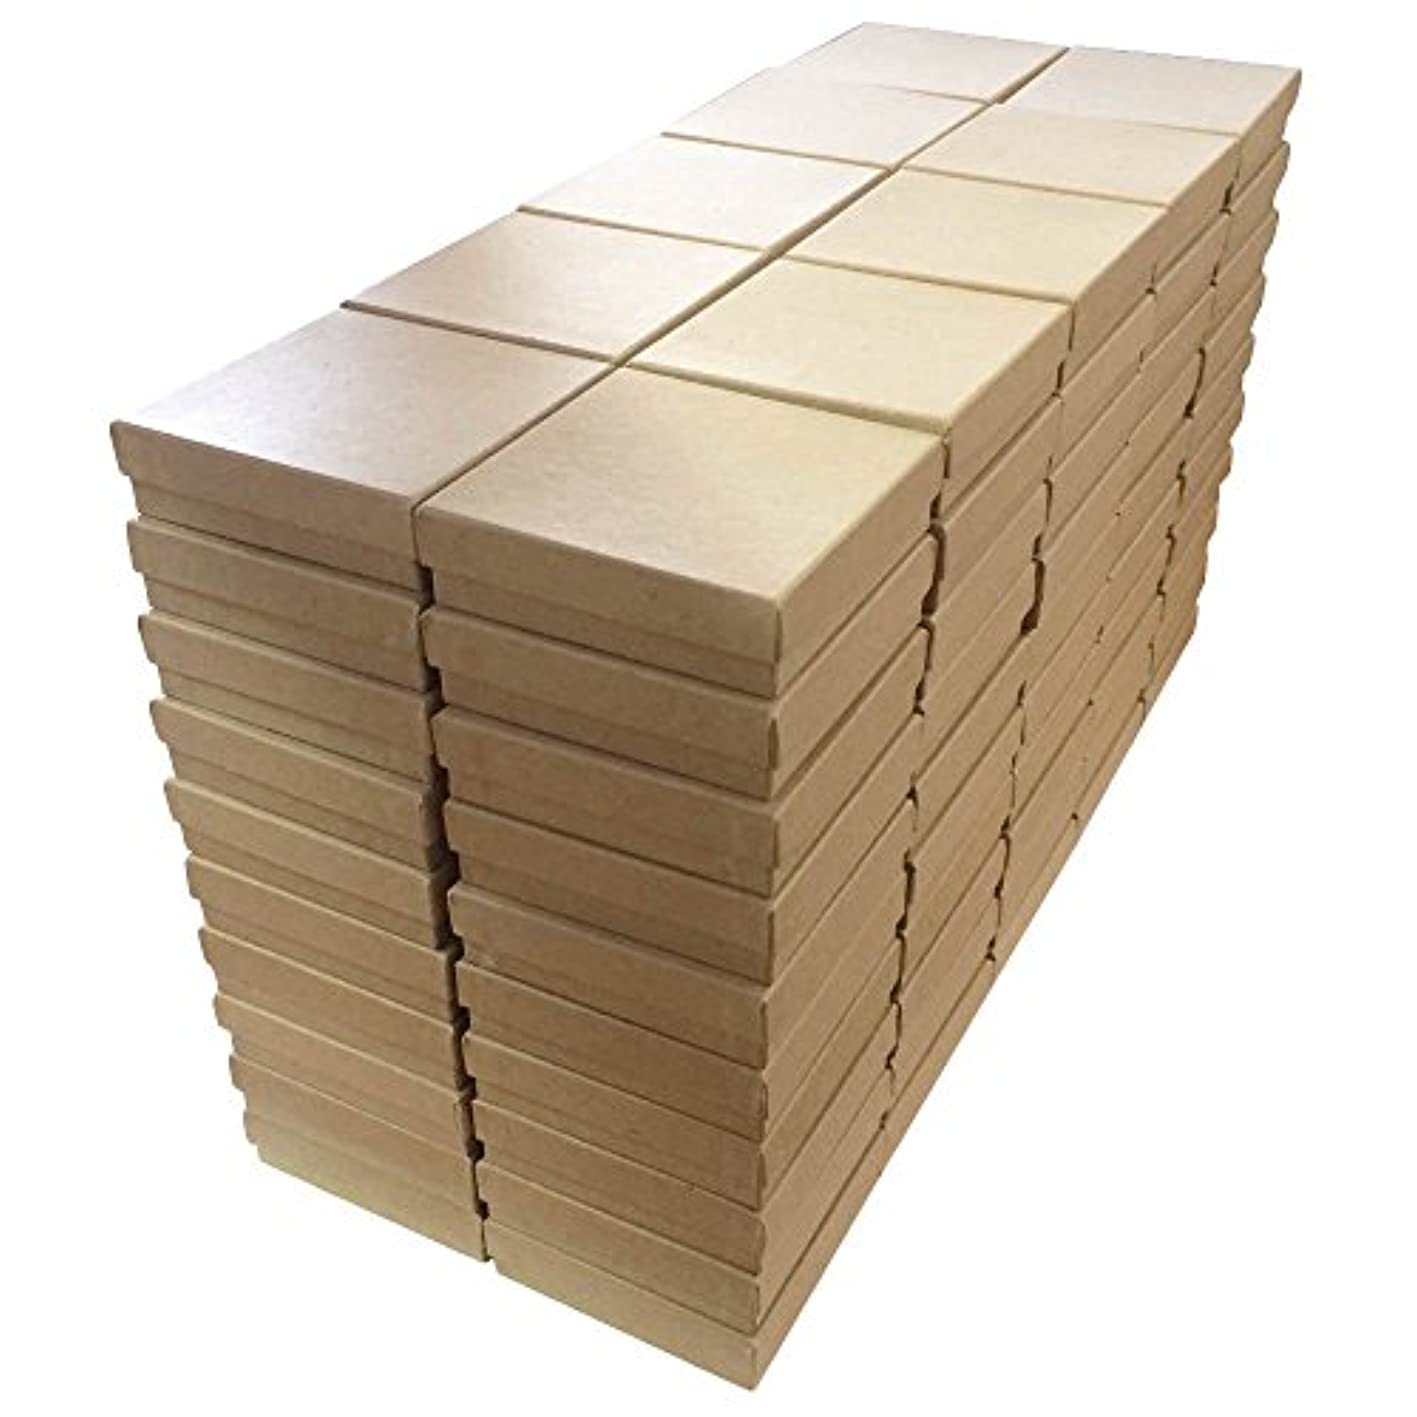 Kraft Cotton Filled Boxes #33 - Pack of 100 votoxjytvjm690